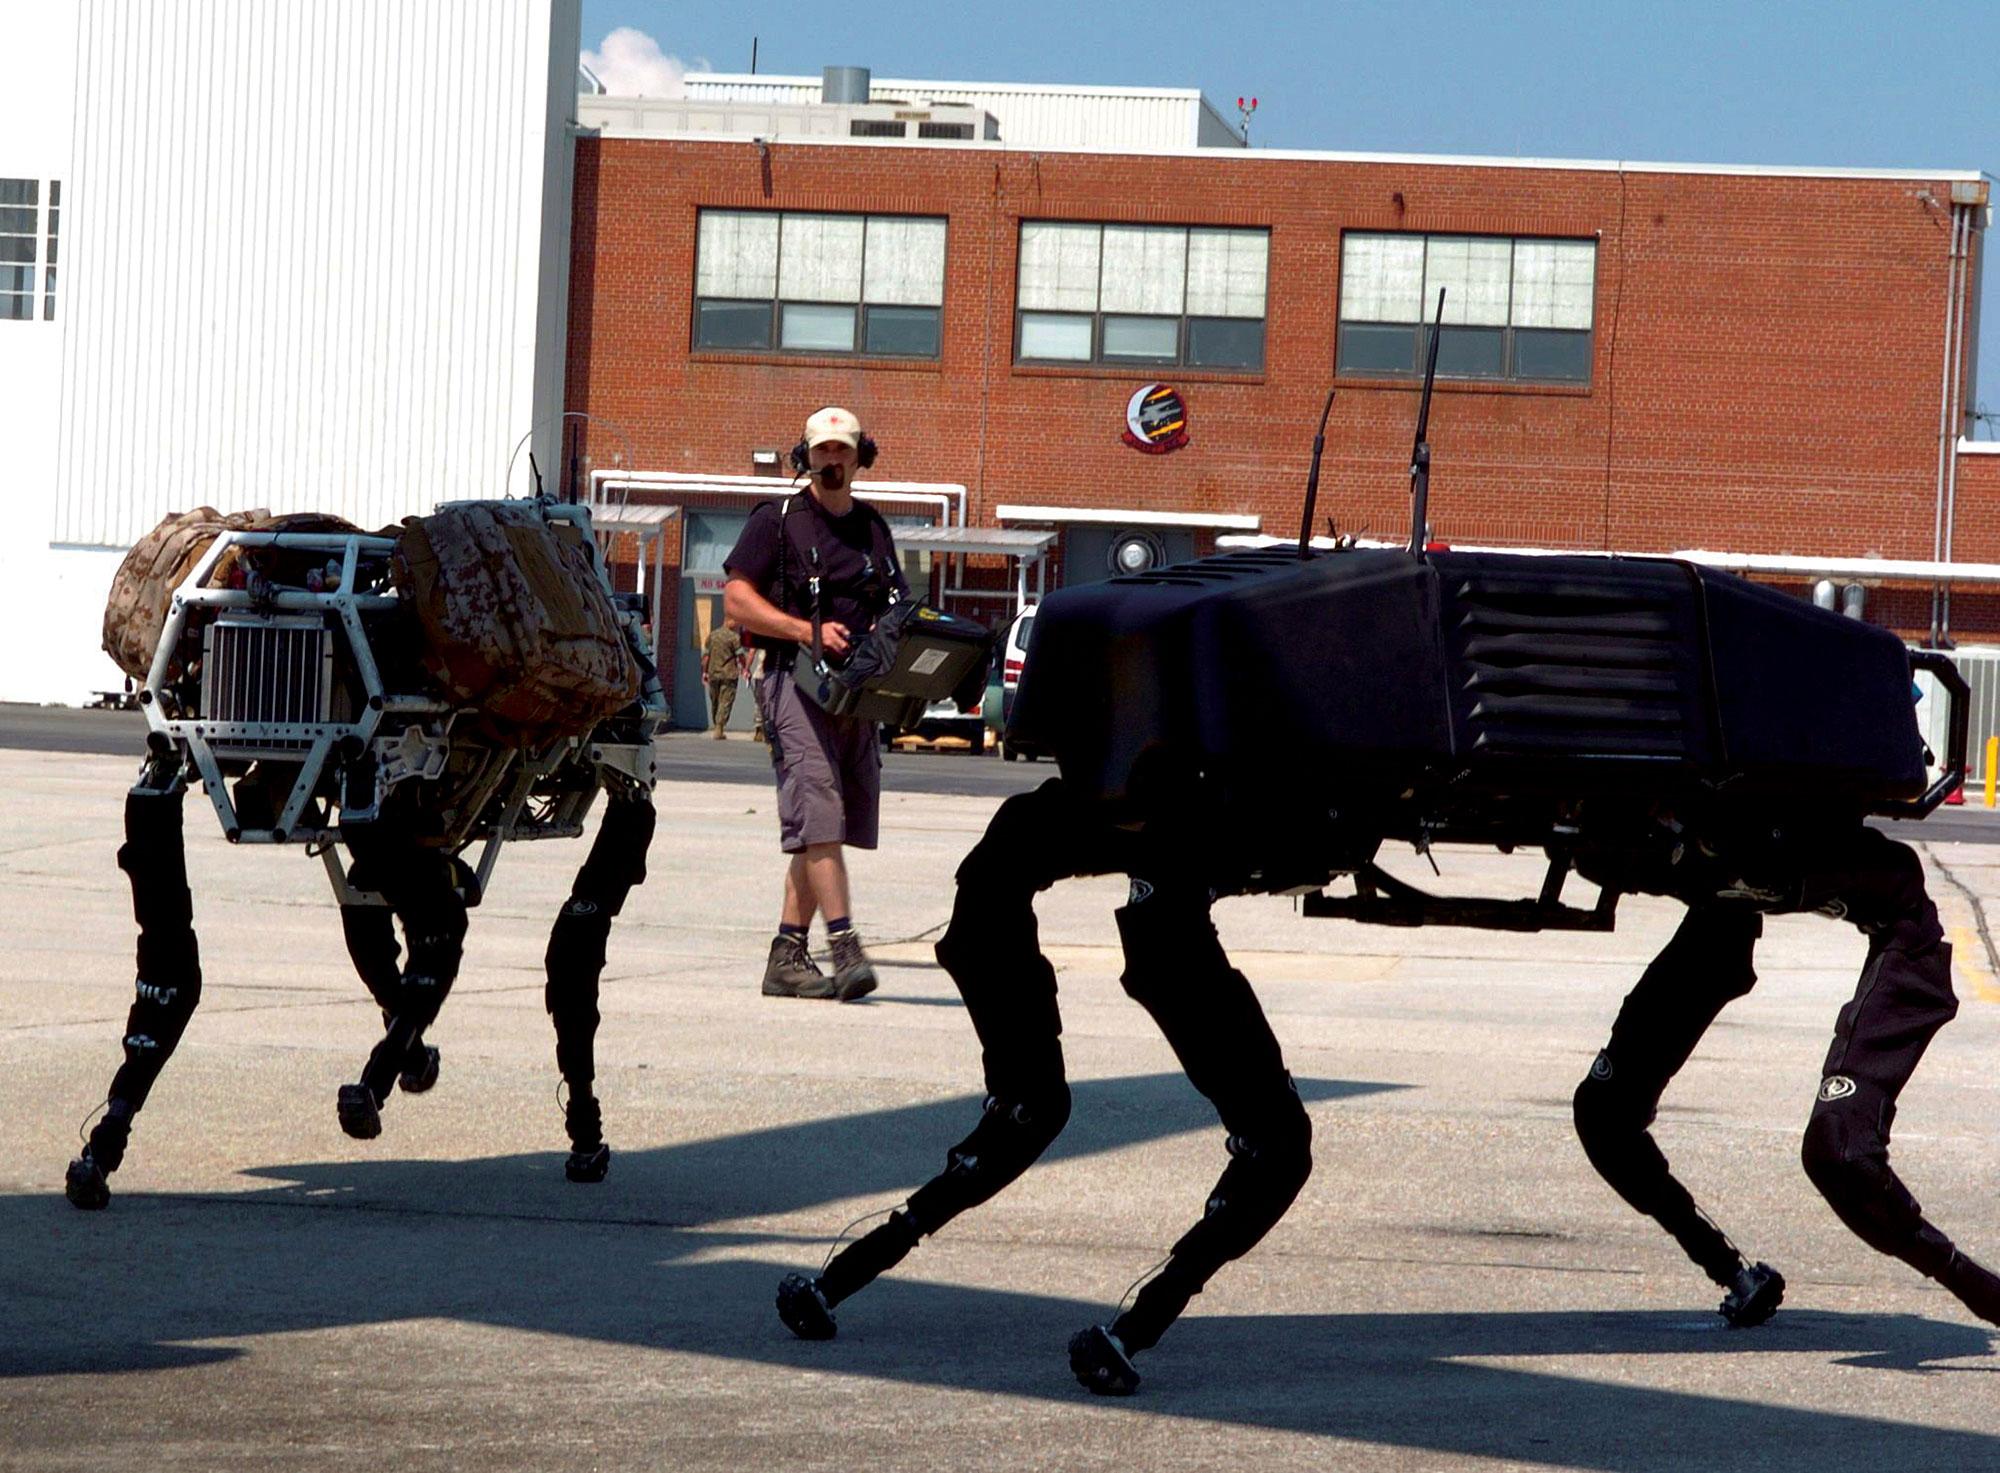 Boston Dynamics BigDog robots operating under remote control.